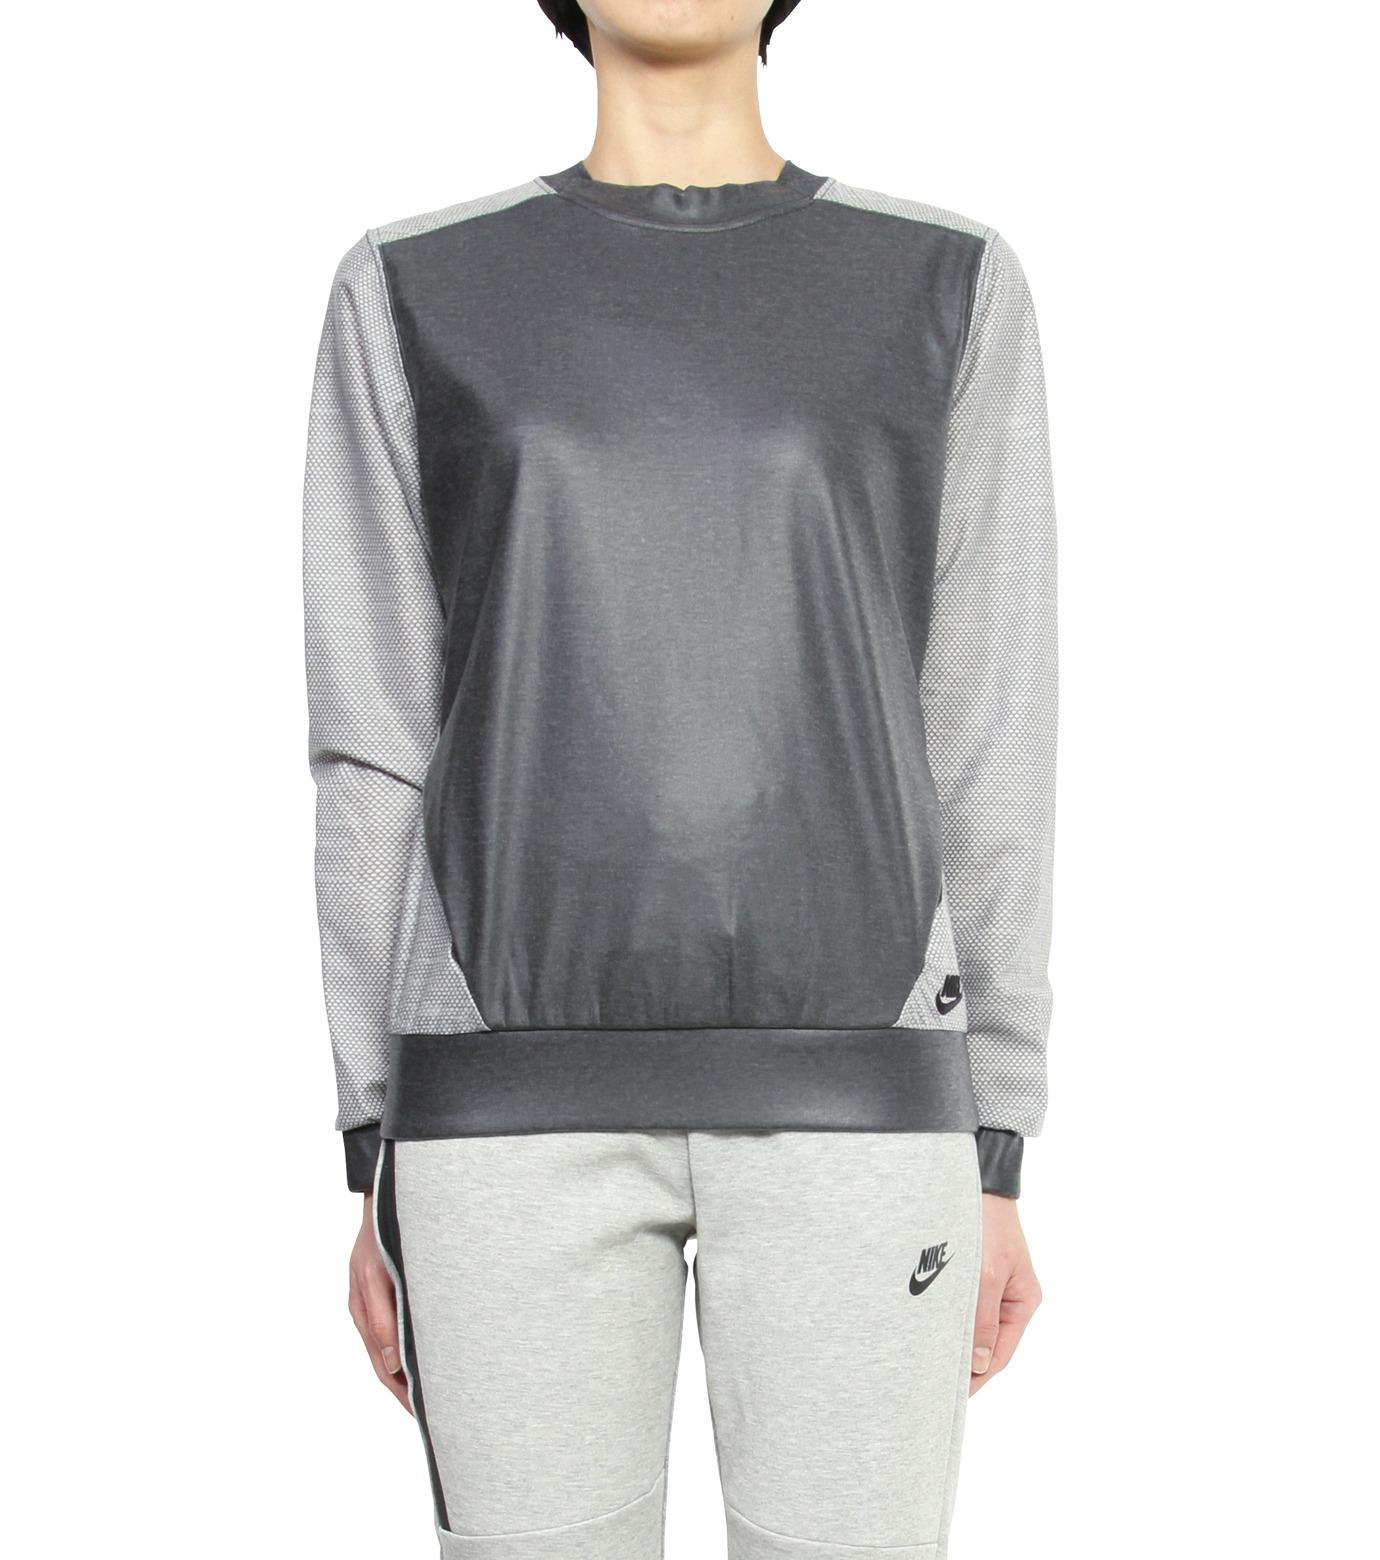 NIKE(ナイキ)のMESH CREW-BLACK(カットソー/cut and sewn)-704663-010-12 拡大詳細画像1